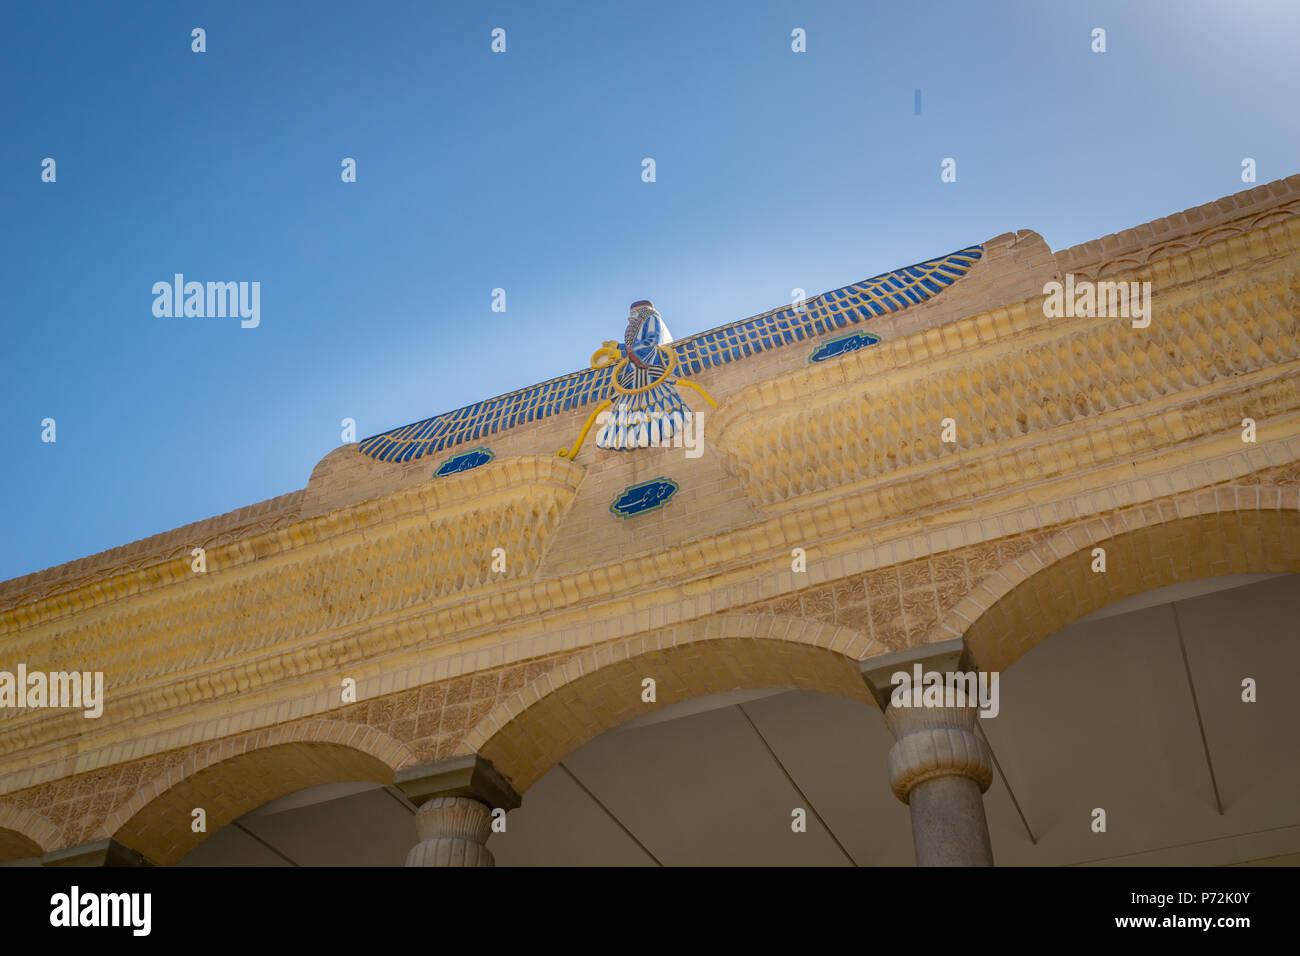 Yazd, Iran - June 2018: Faravahar mosaic symbol on Zoroastrian fire temple Atash Behram in old city of Yazd, Iran. - Stock Image